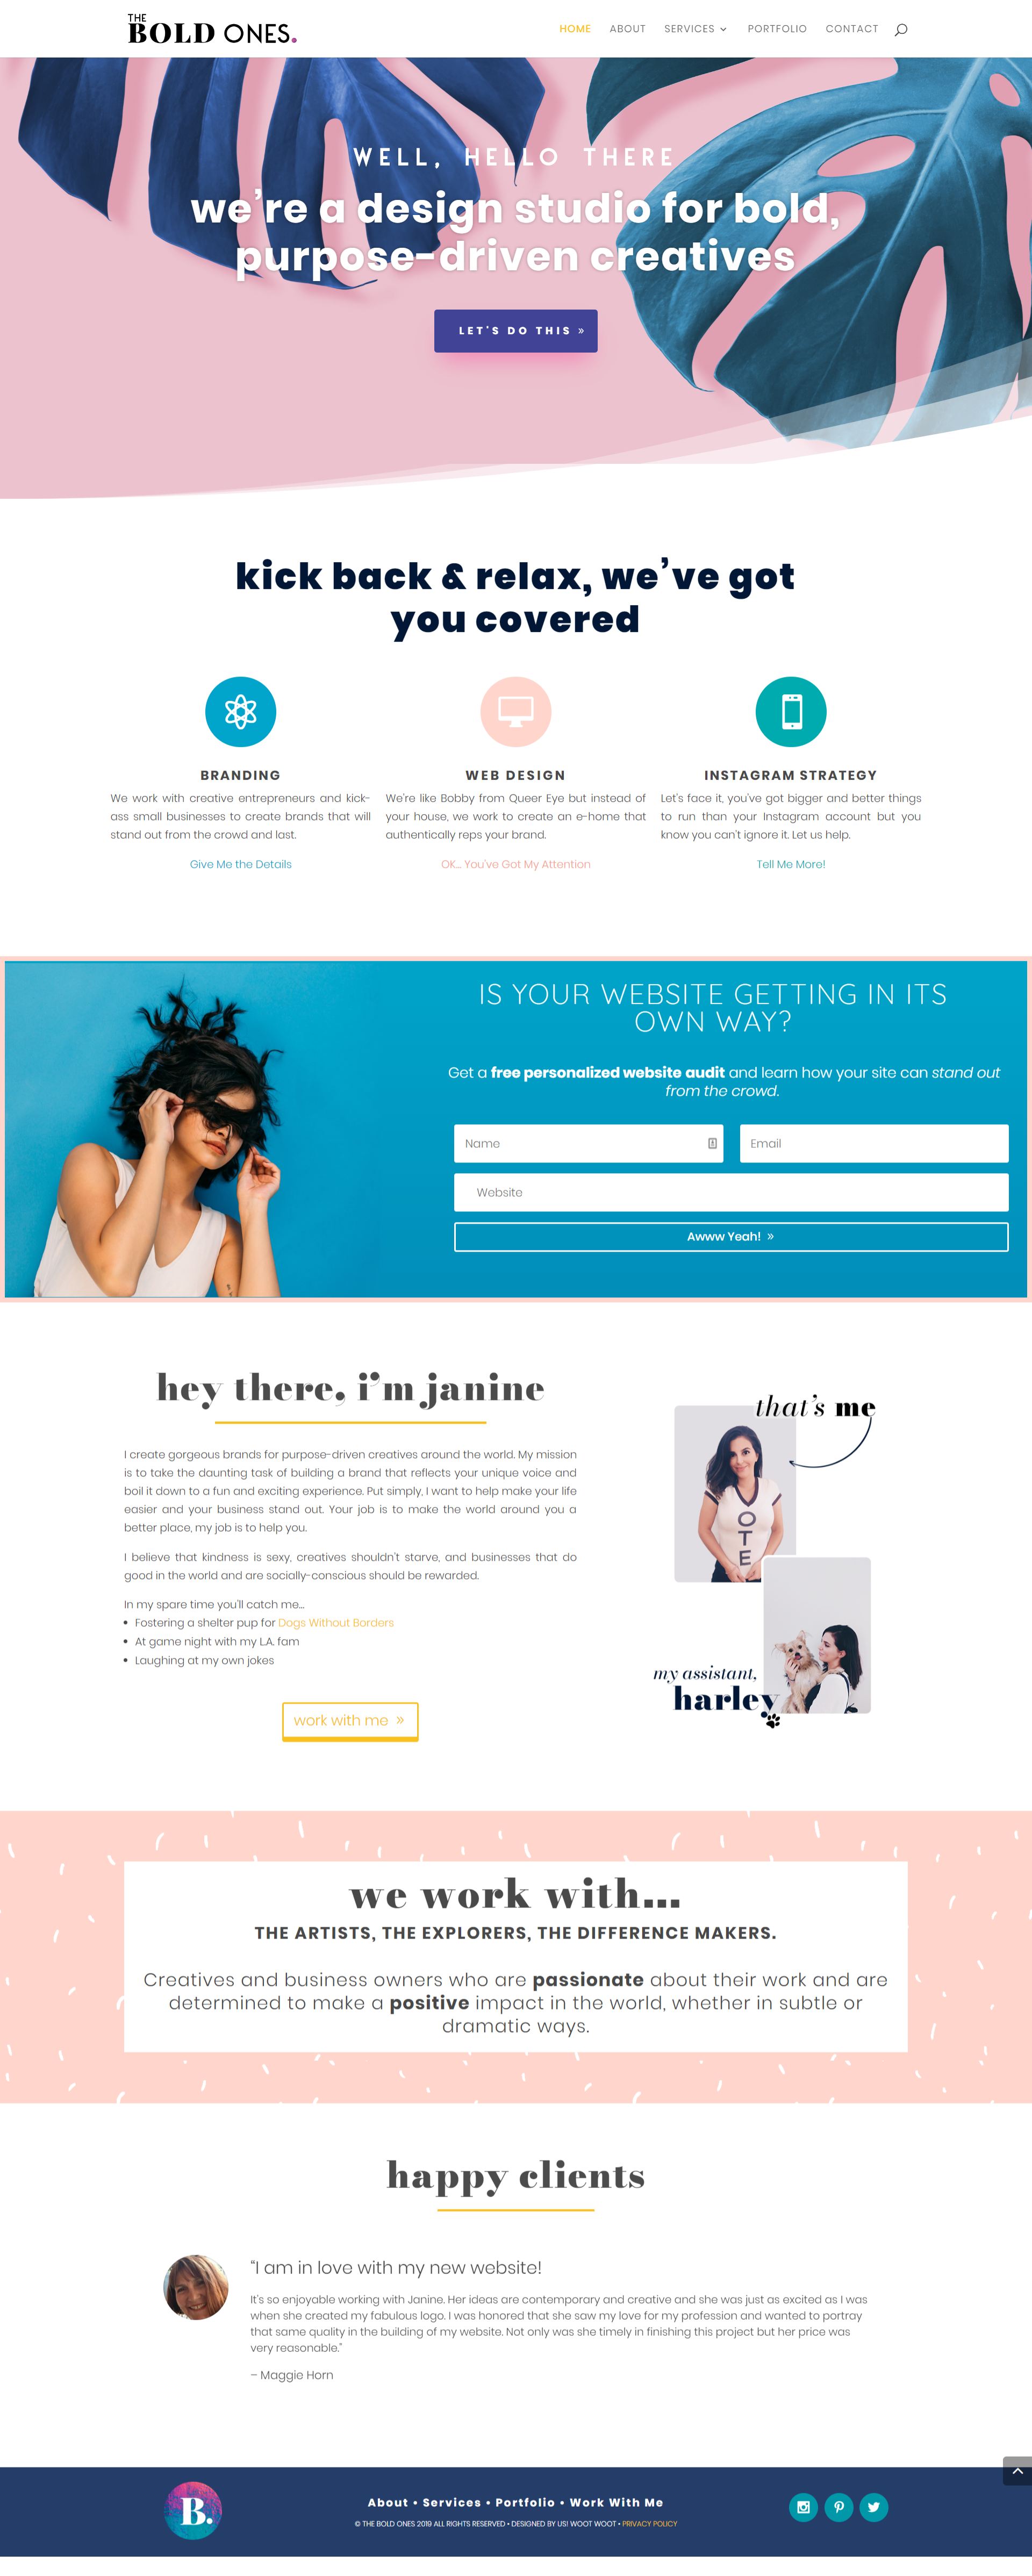 The Bold Ones Branding And Design Studio Homepage Layout Design Homepage Design Web Design Studio